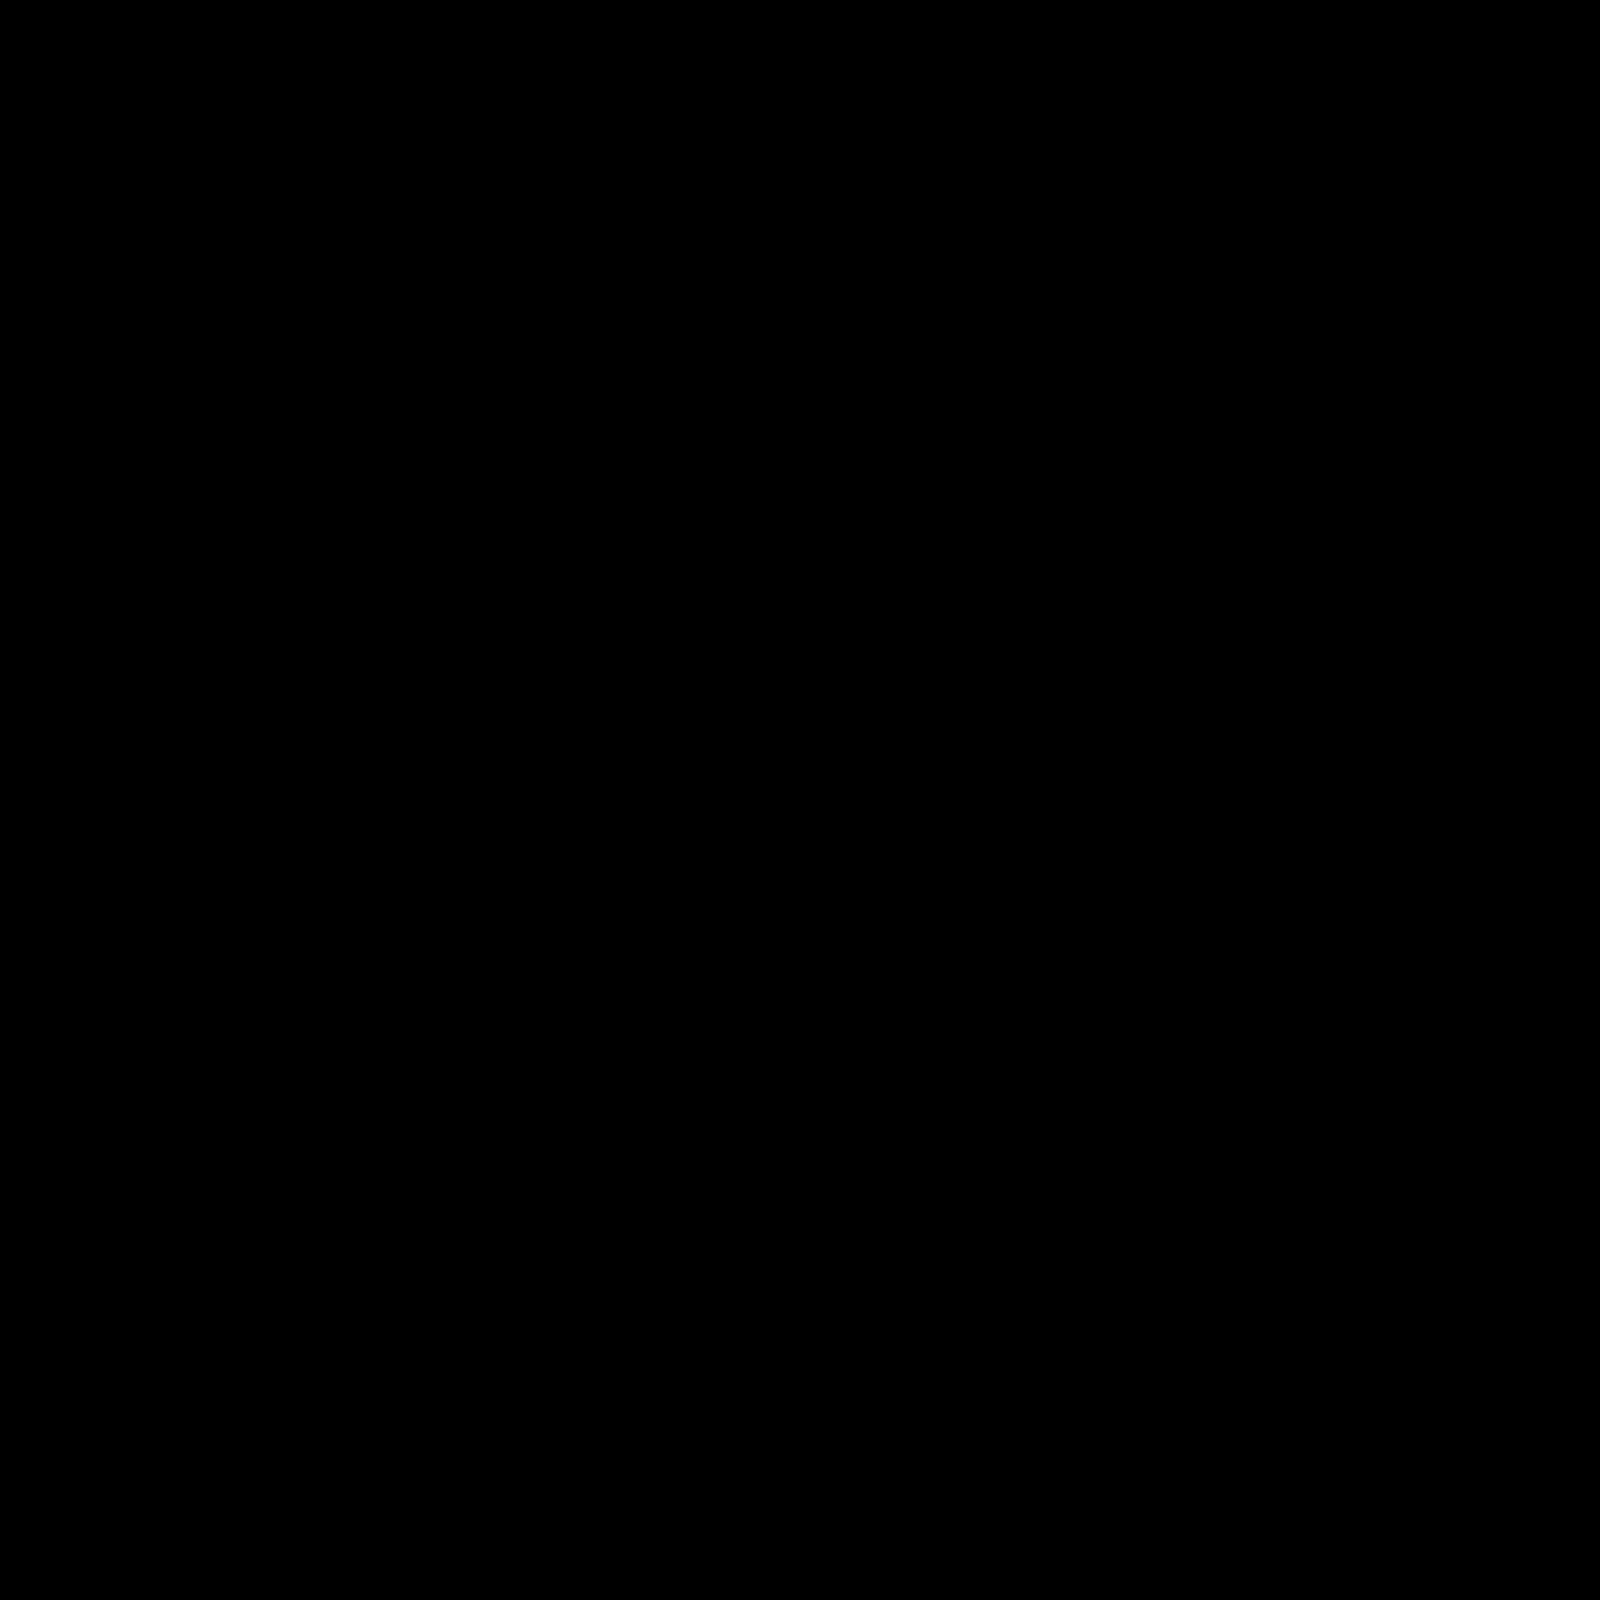 Шифрование данных icon